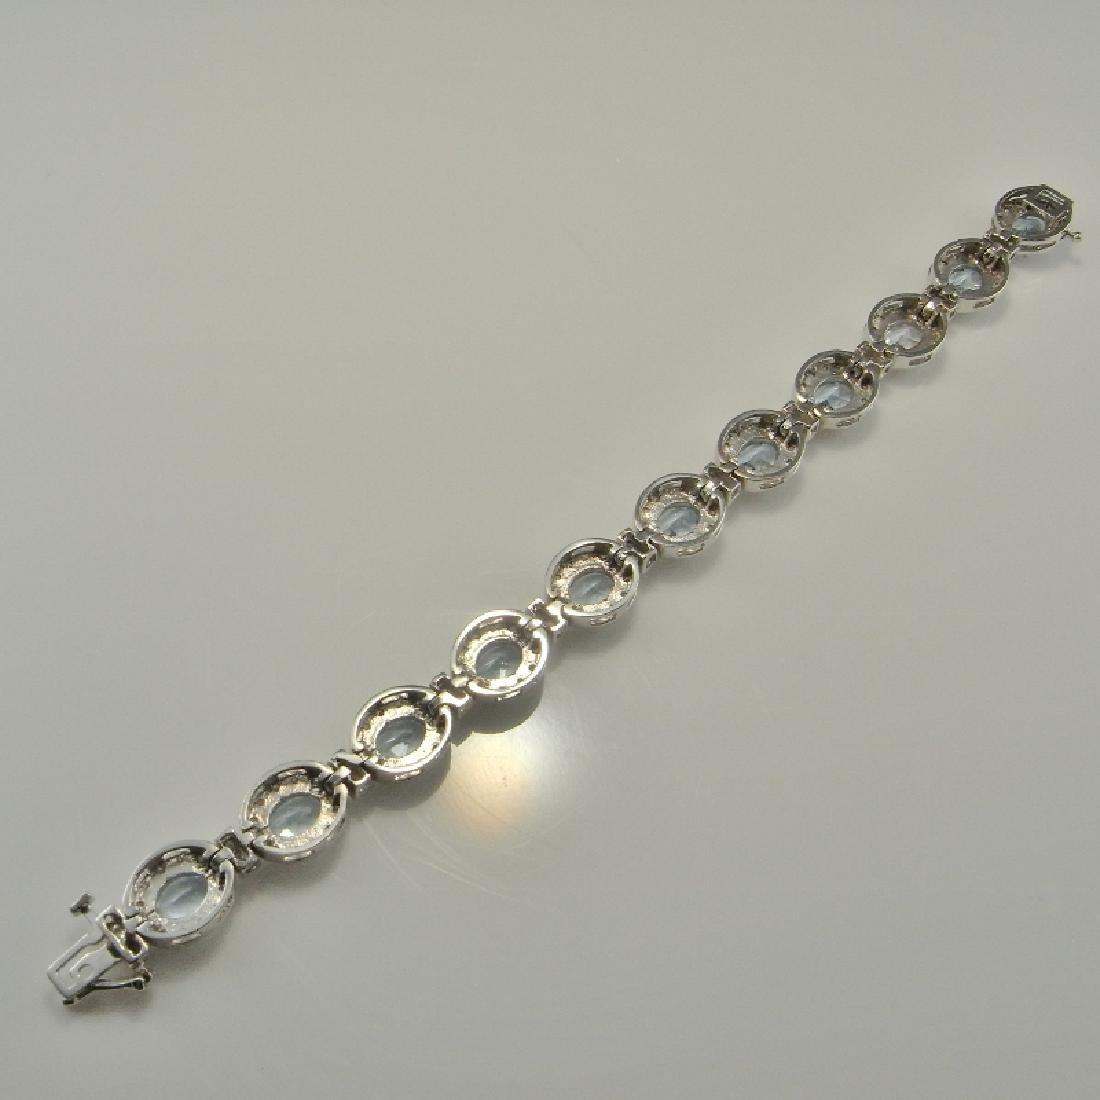 AQUAMARINE DIAMOND BRACELET 14K GOLD 16.61 CTW - 7